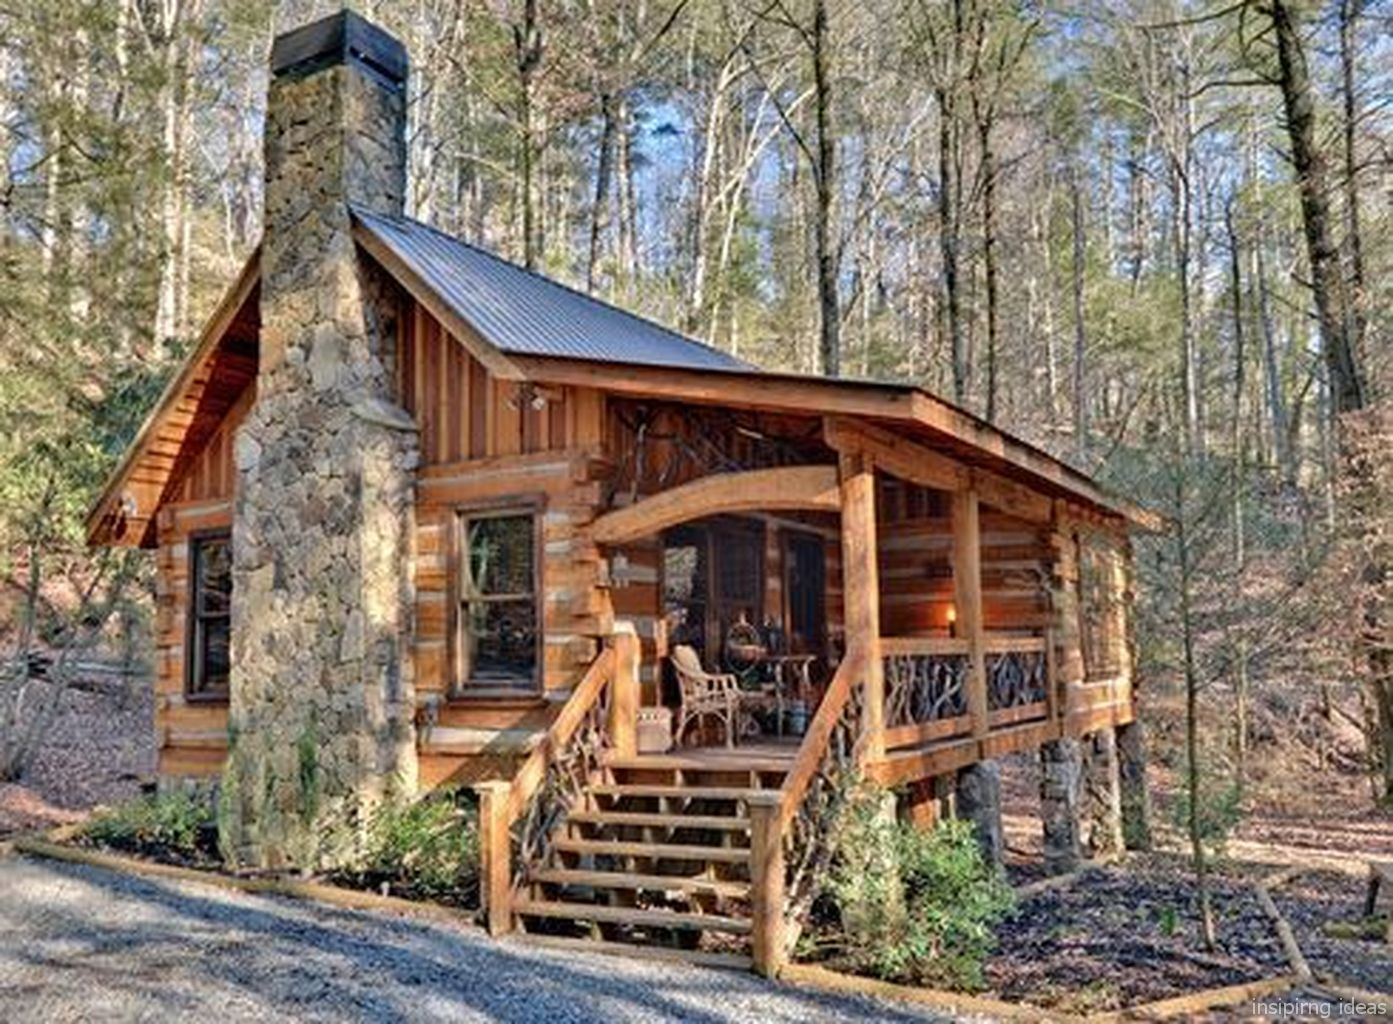 Stunning Log Cabin Homes Plans Ideas 22 Lovelyving Com Small Log Homes Small Log Cabin House In The Woods